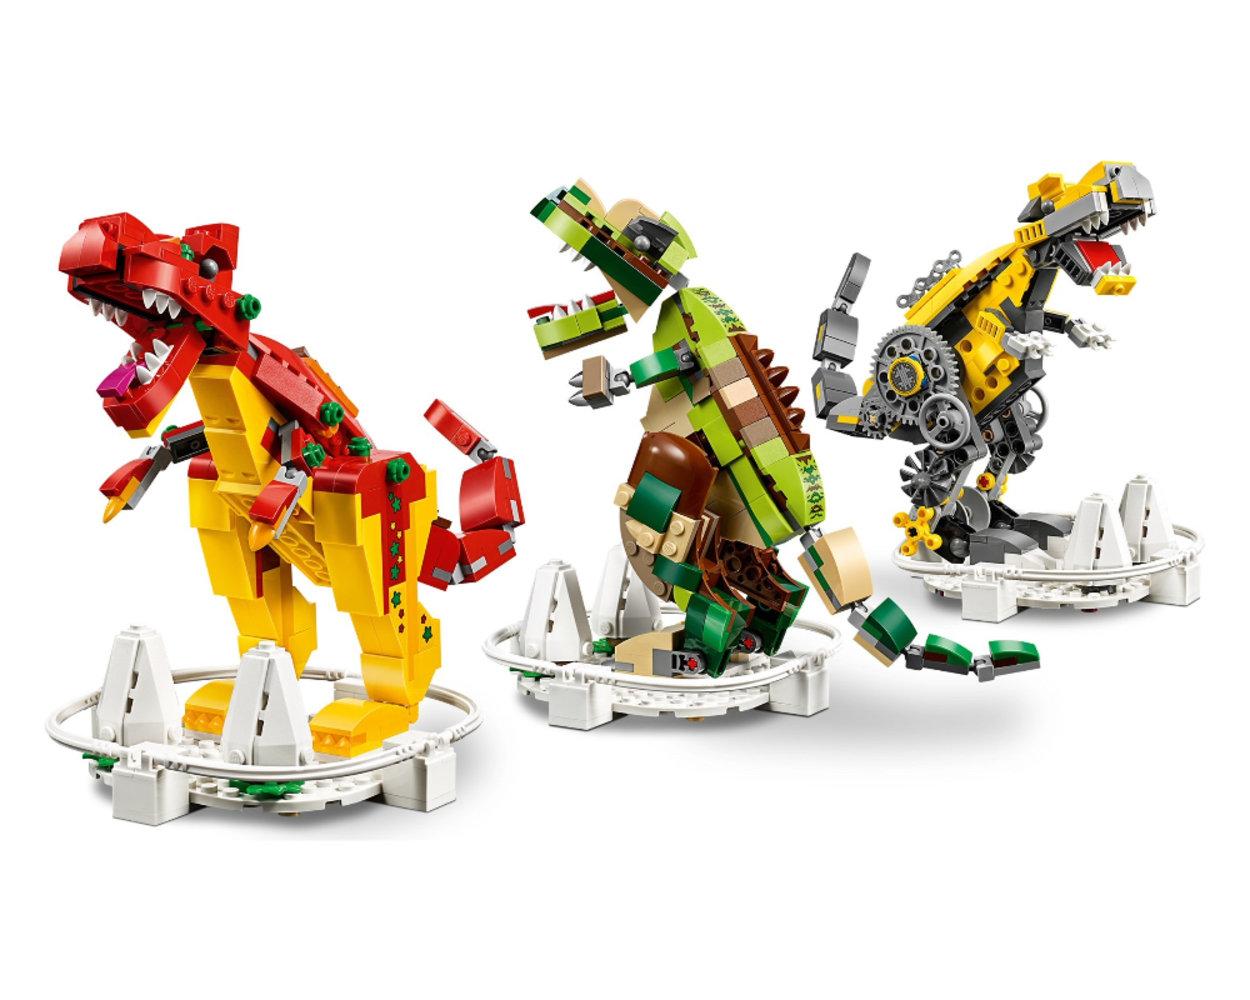 LEGO House Dinosaurs